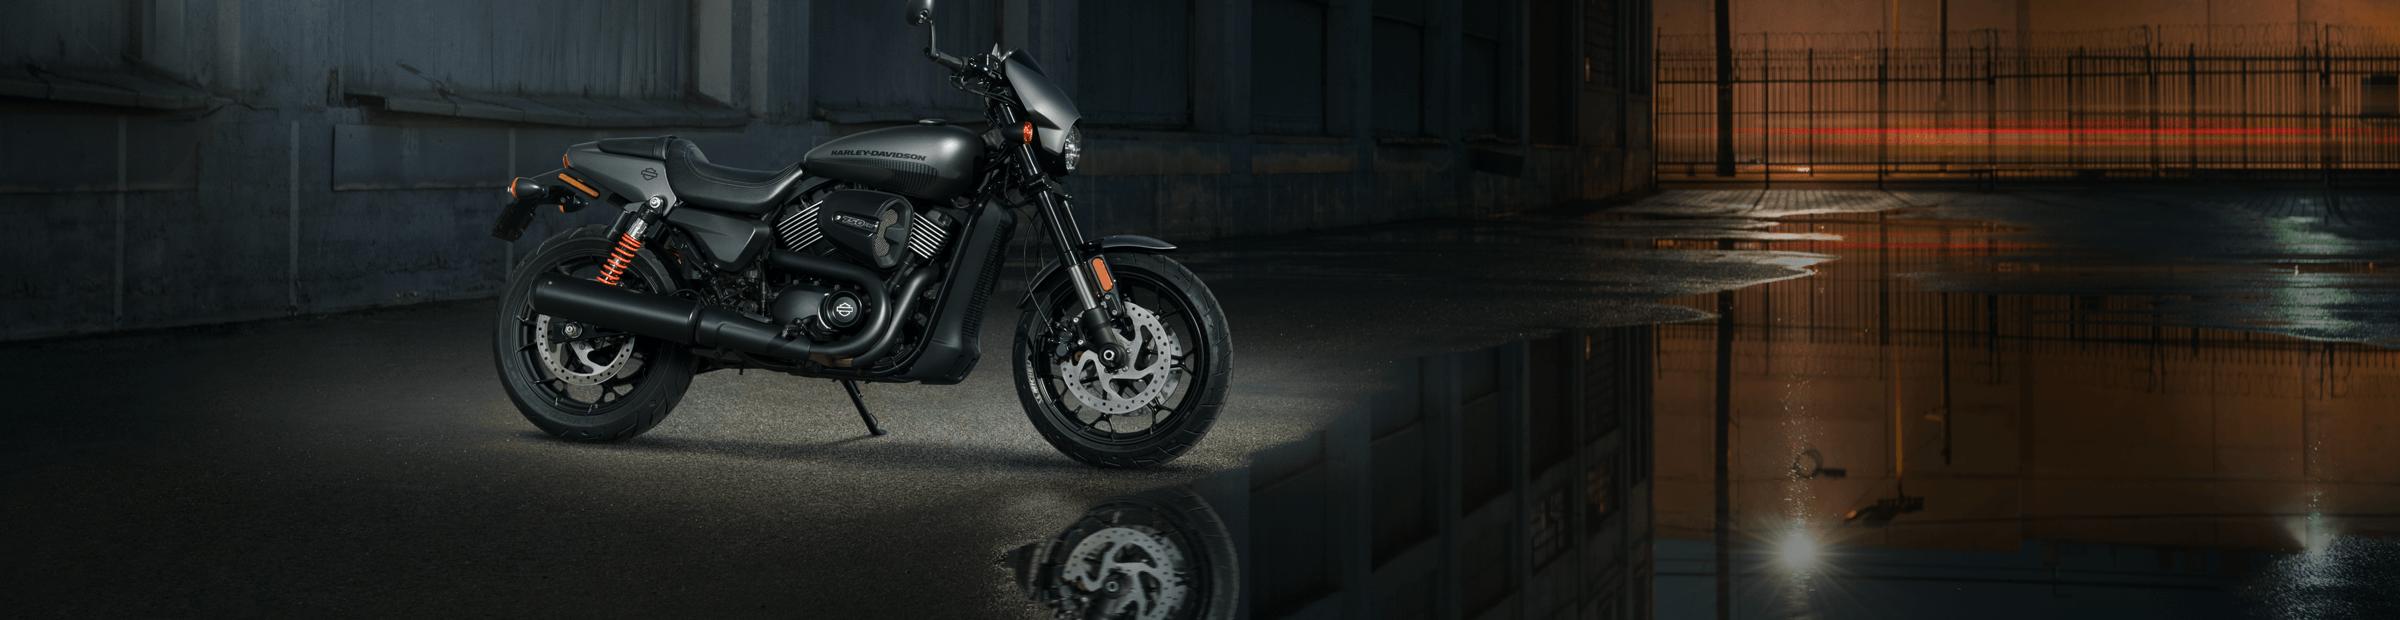 Sälj din Harley